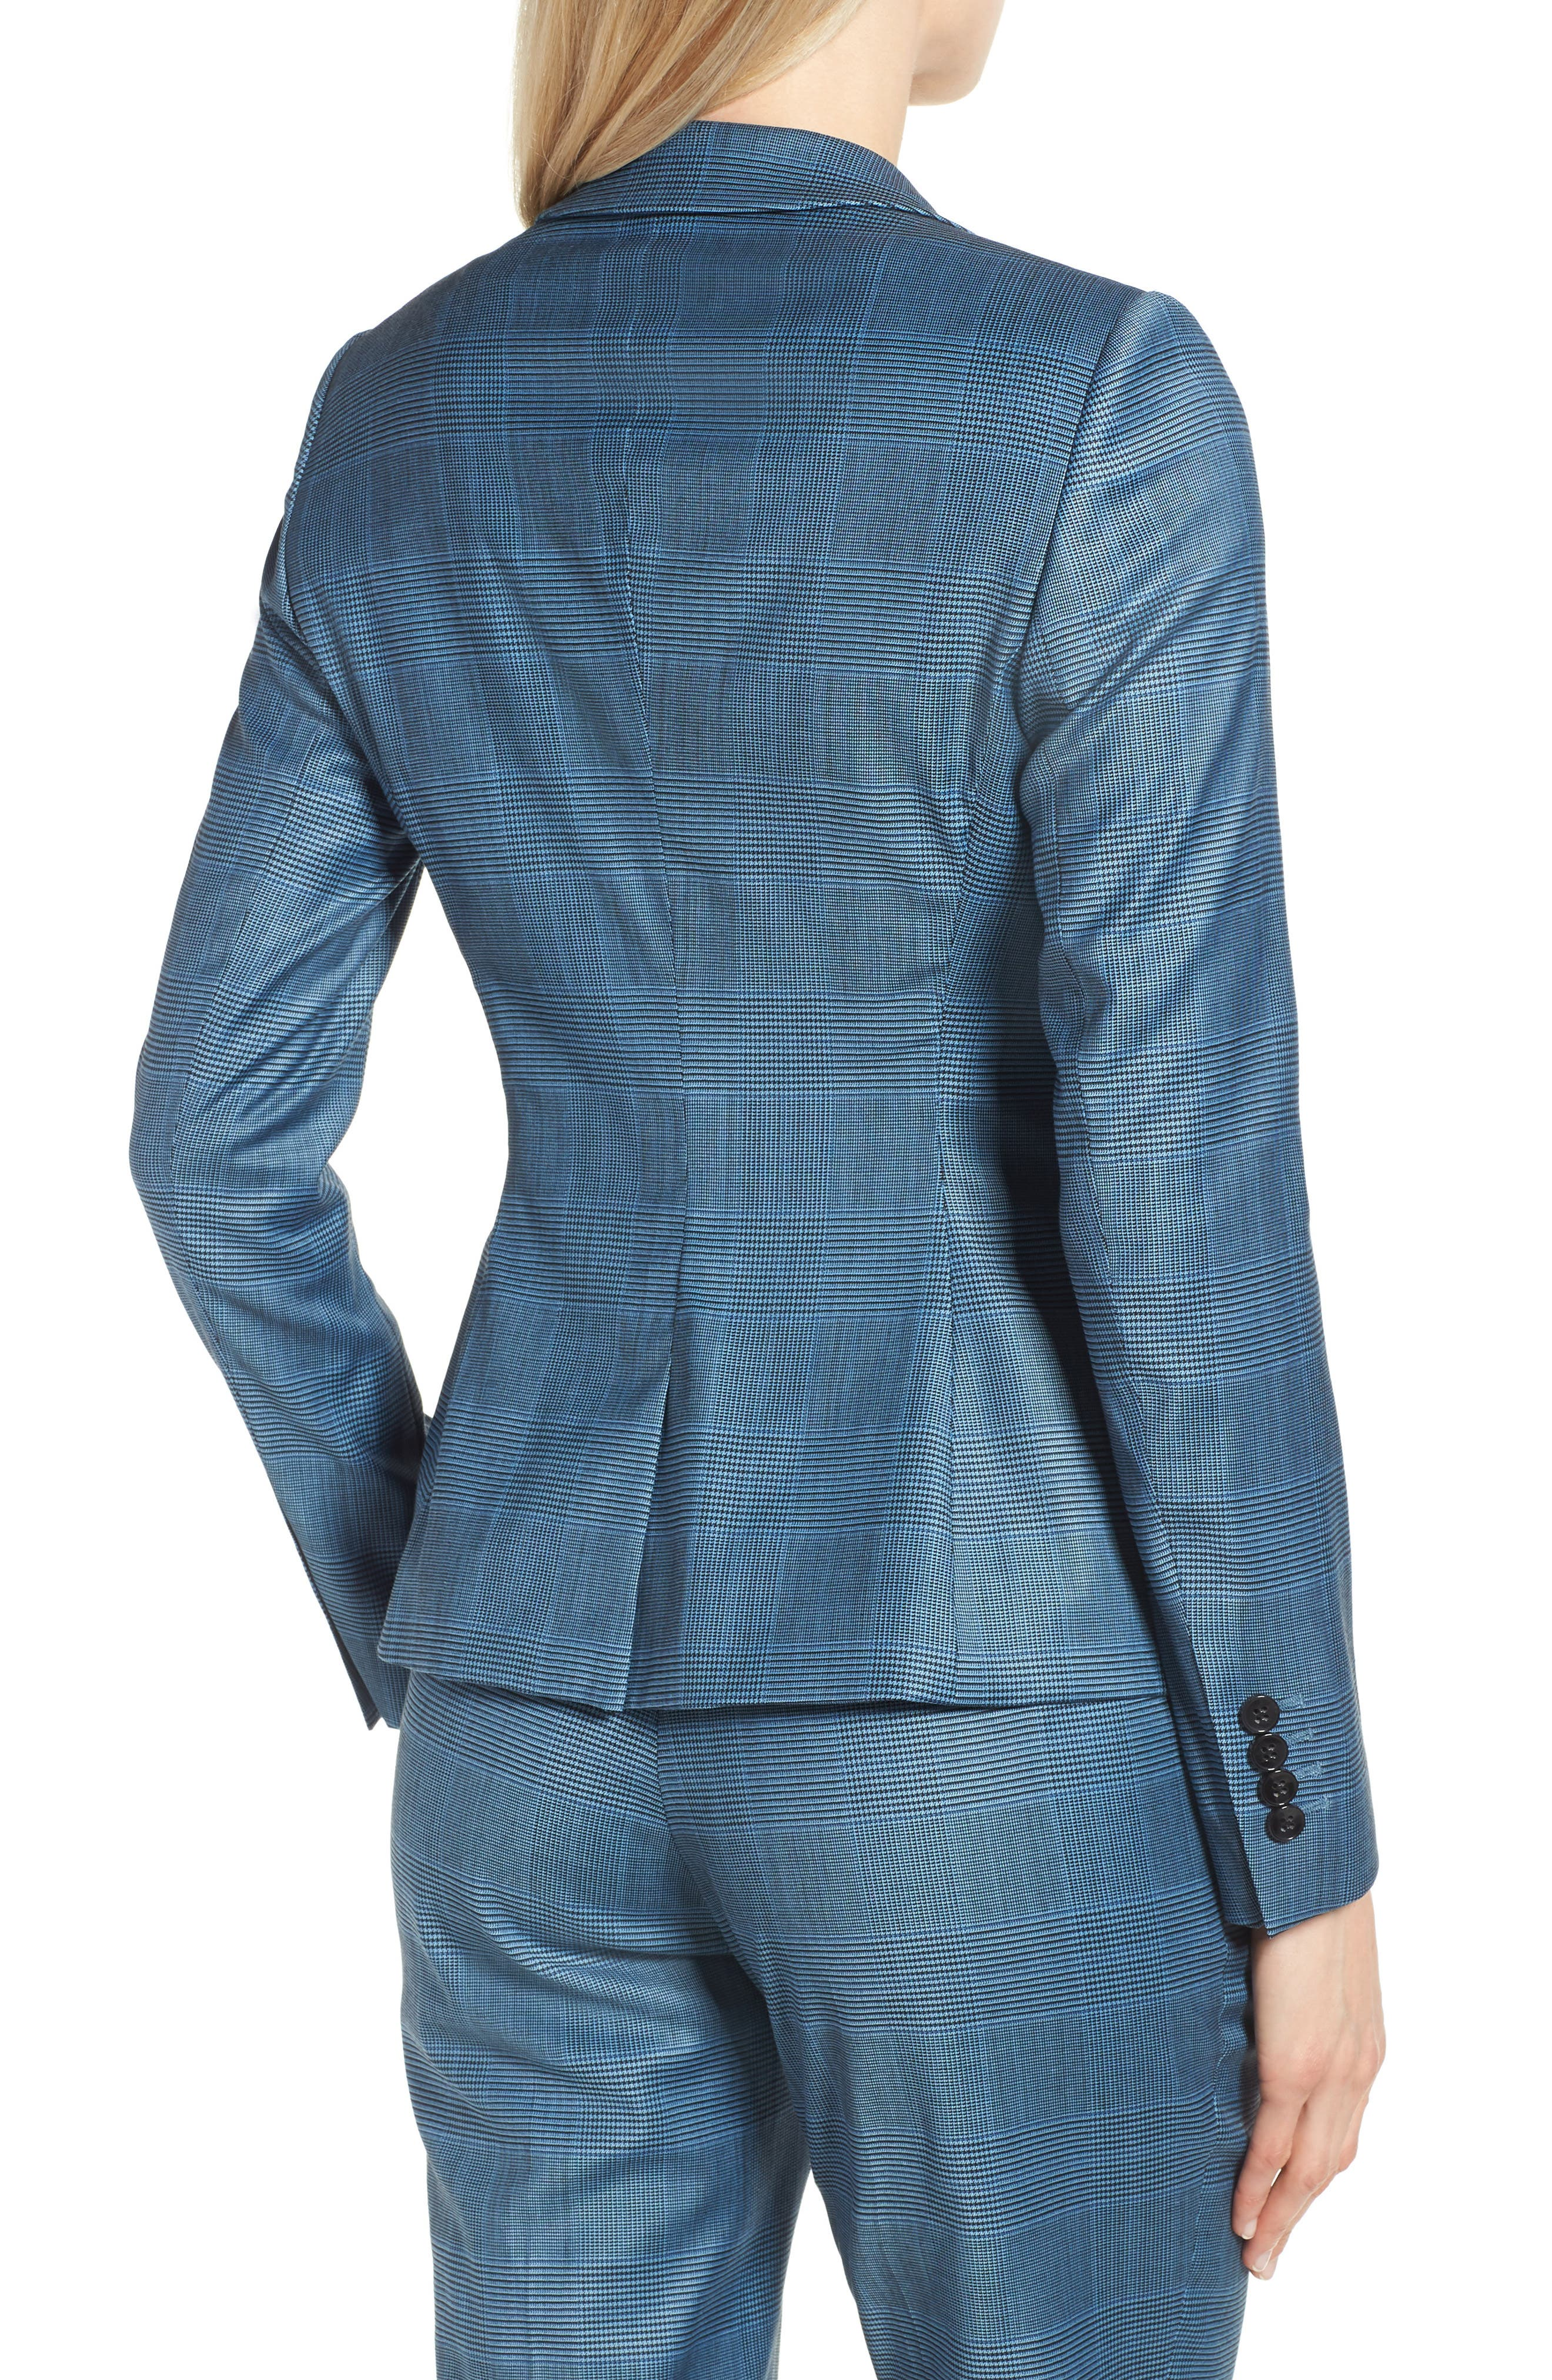 Jelaya Glencheck Double Breasted Suit Jacket,                             Alternate thumbnail 2, color,                             Sailor Blue Fantasy